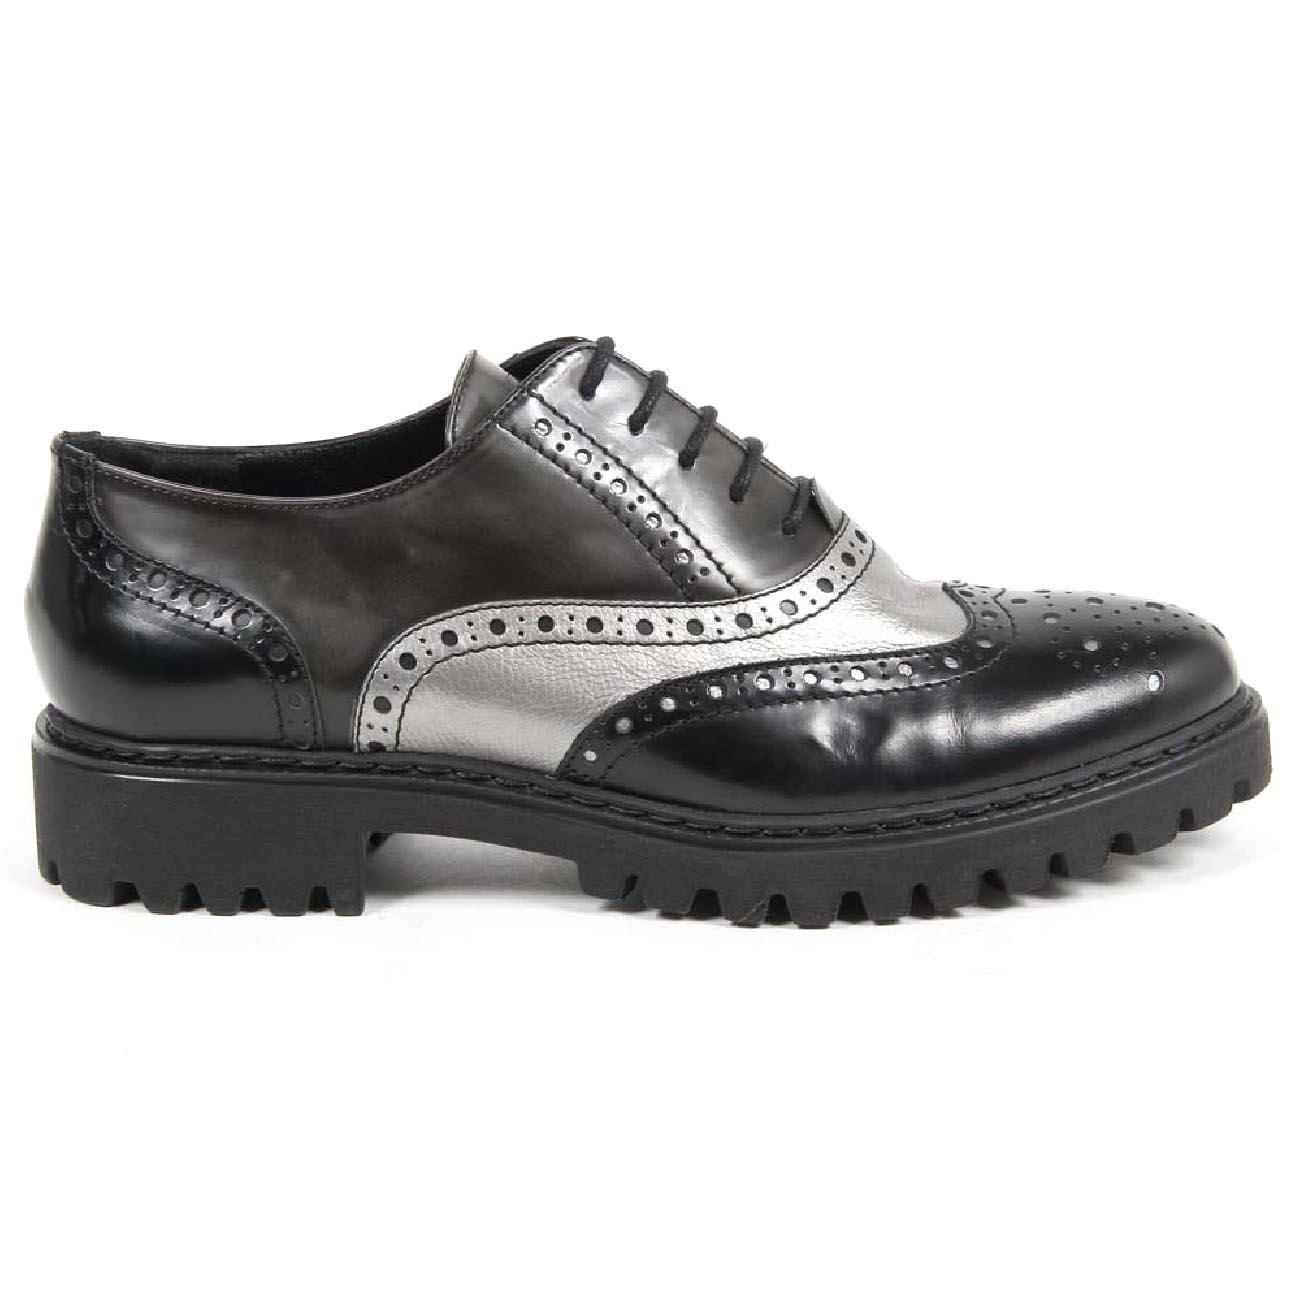 V 1969 Italia Women's Oxford Shoe 5135 ABRASIVATO NERO